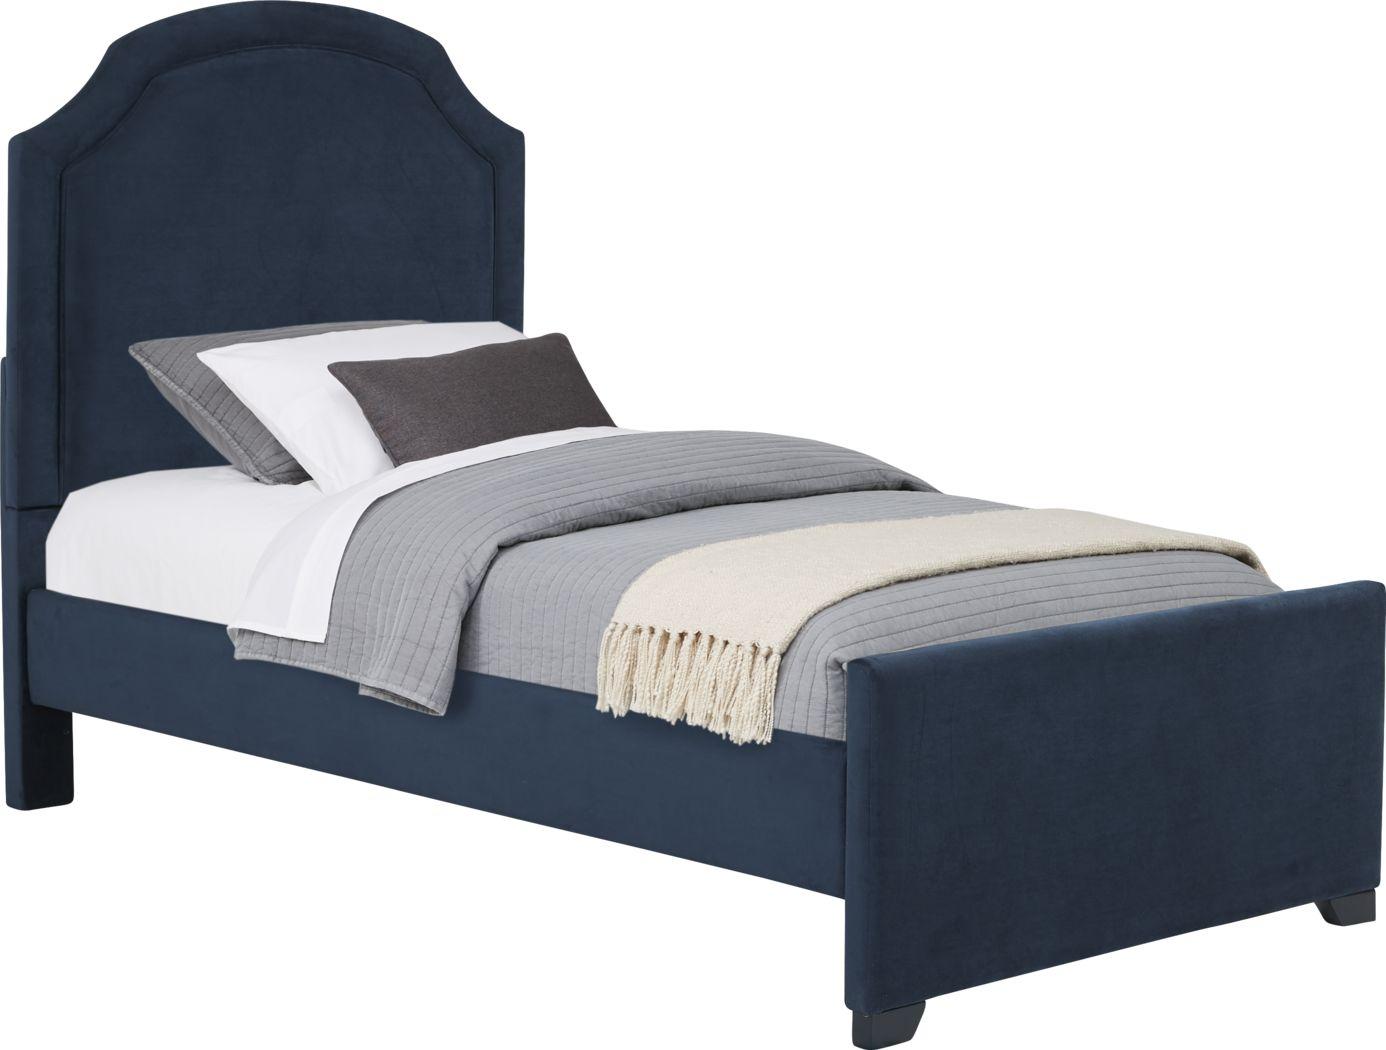 Kids Dakotah Navy 3 Pc Twin Upholstered Bed